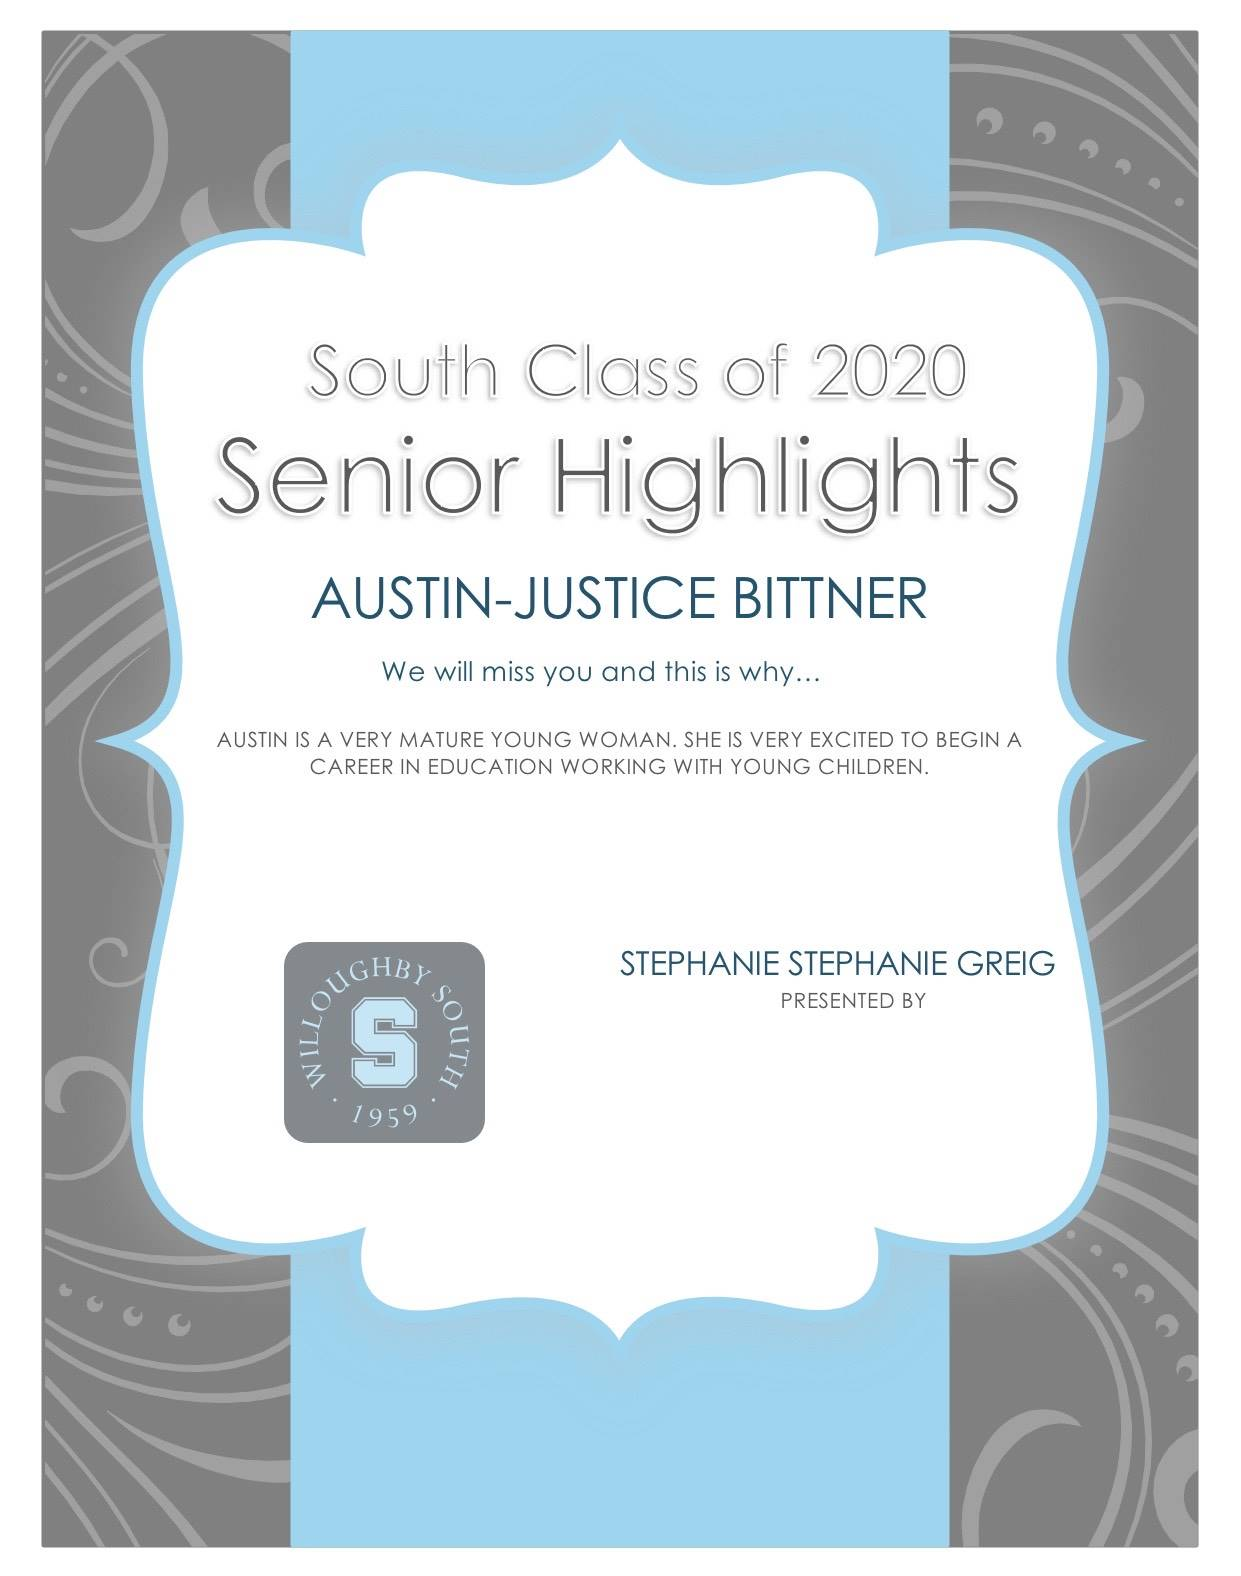 Austin -Justice Bittner